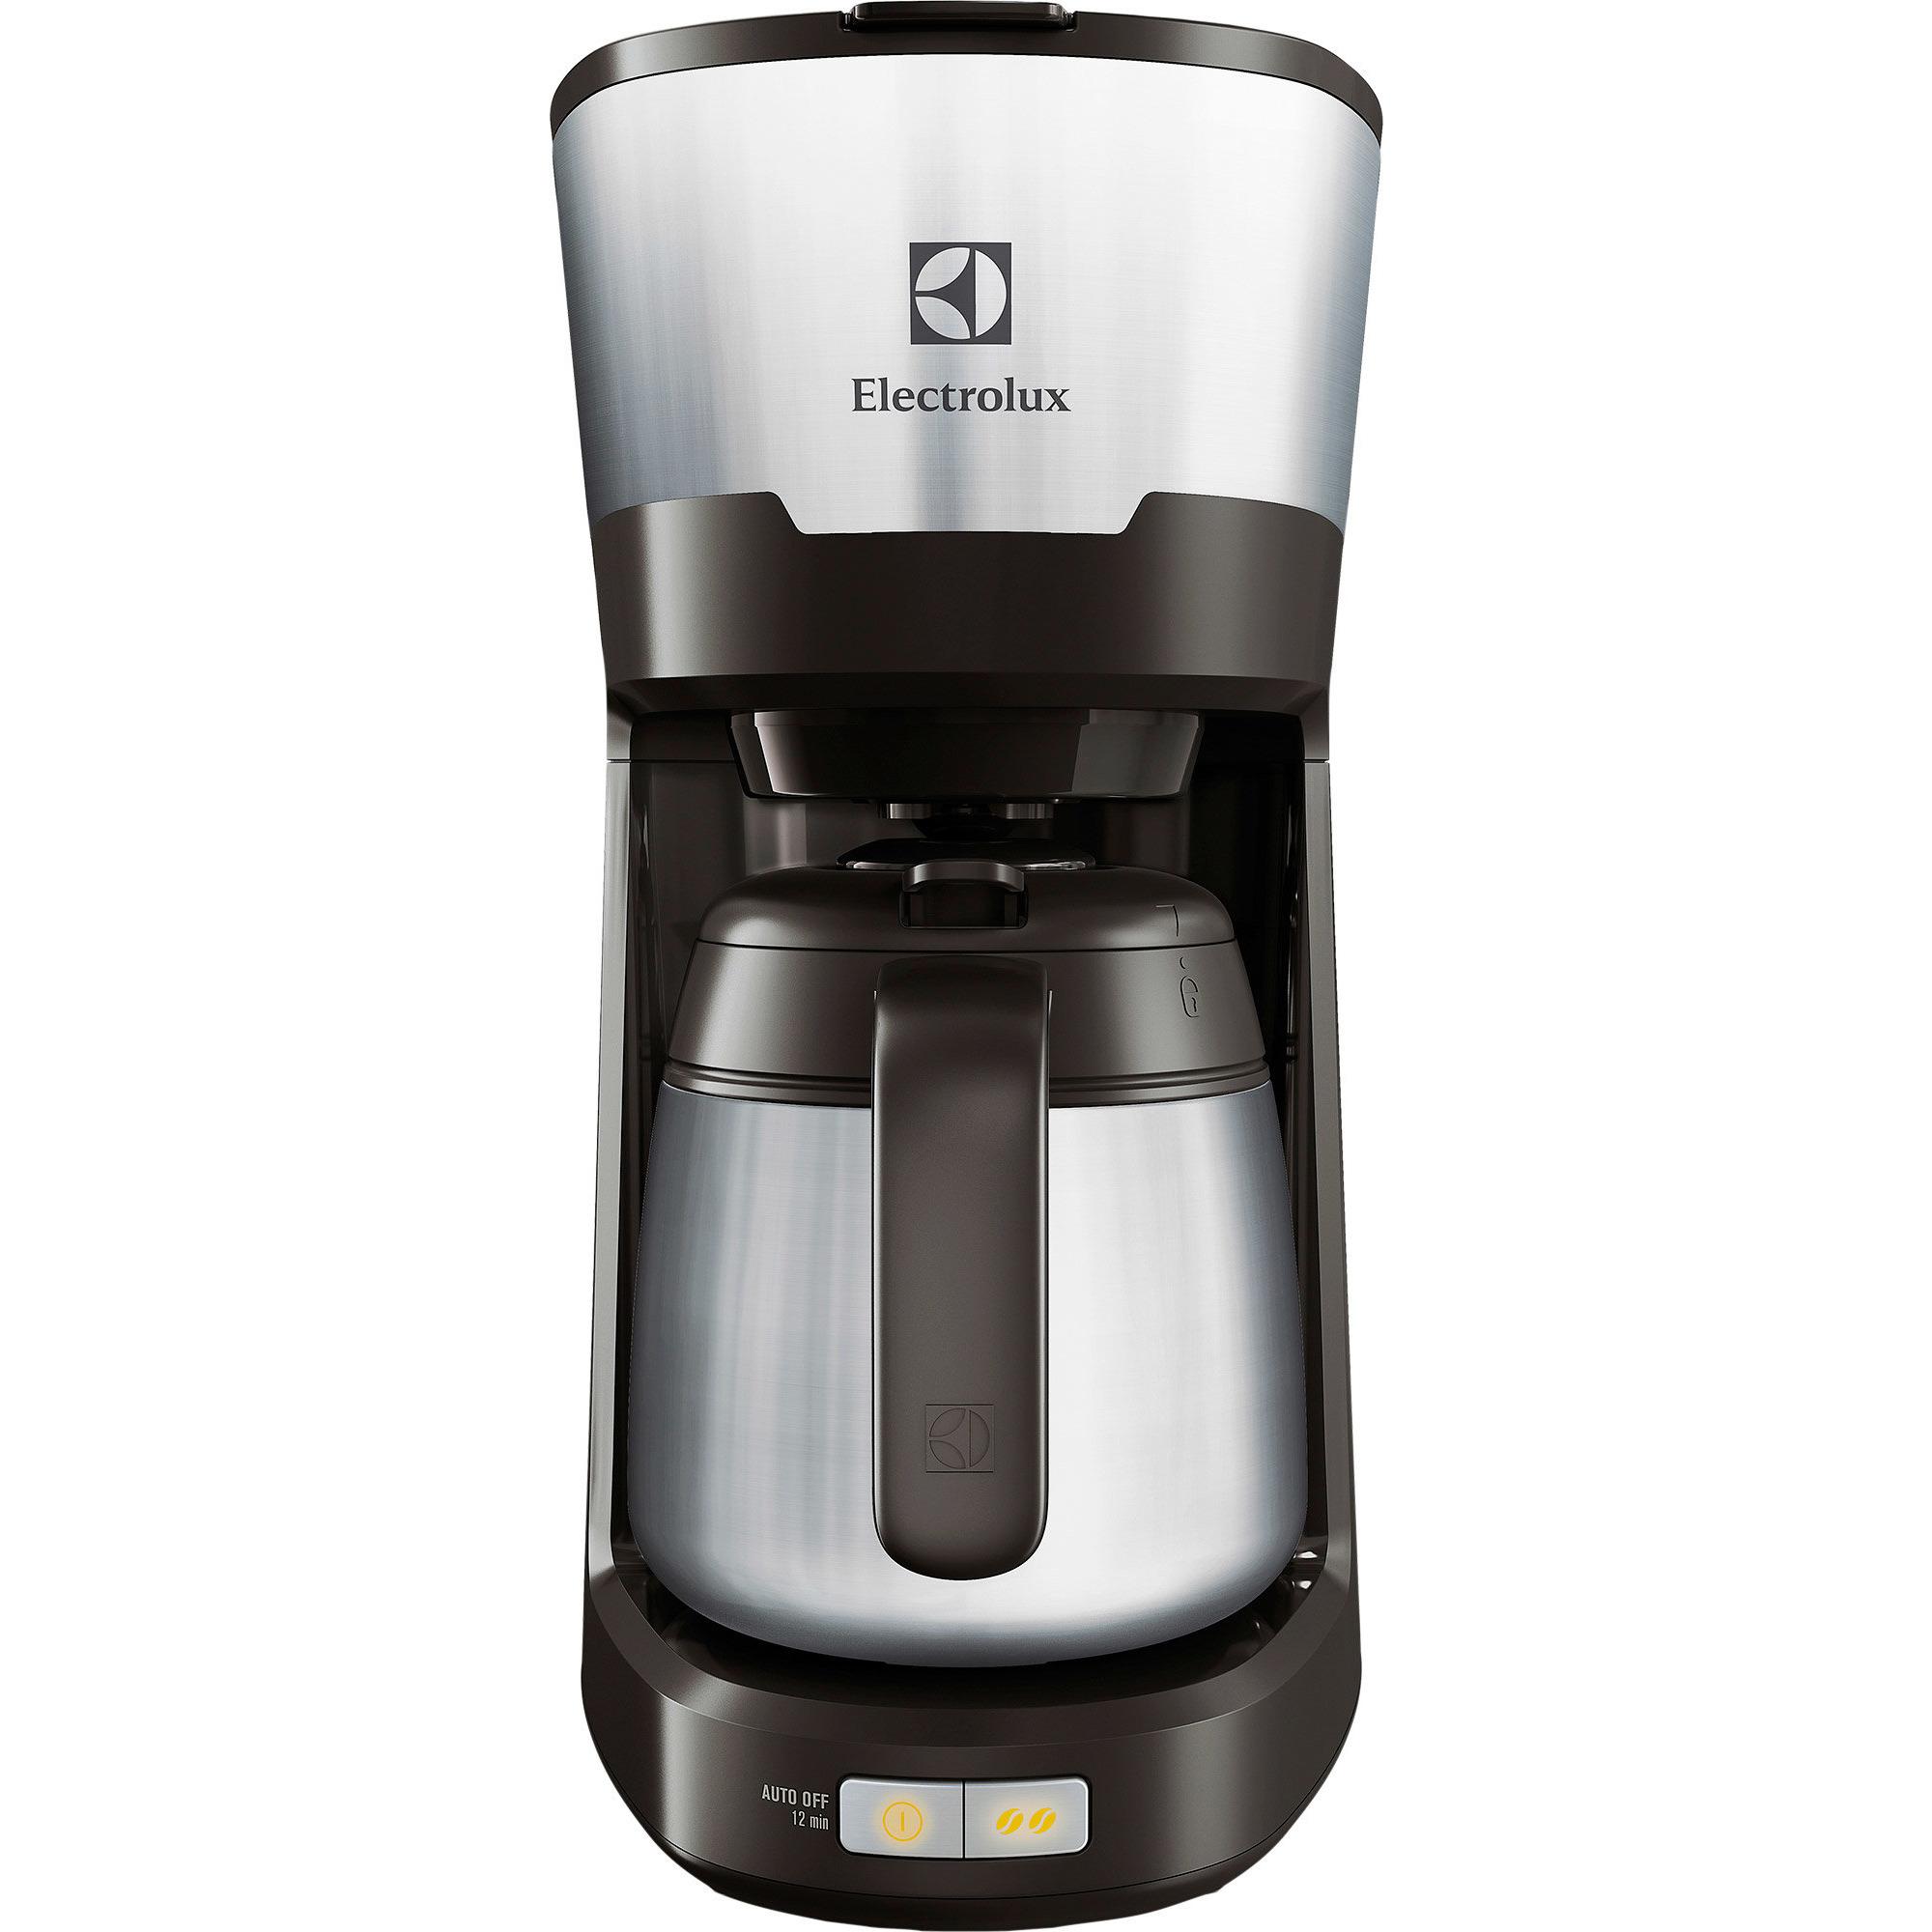 Electrolux Creative Collection Kaffebryggare EKF5700 Rostfritt stål